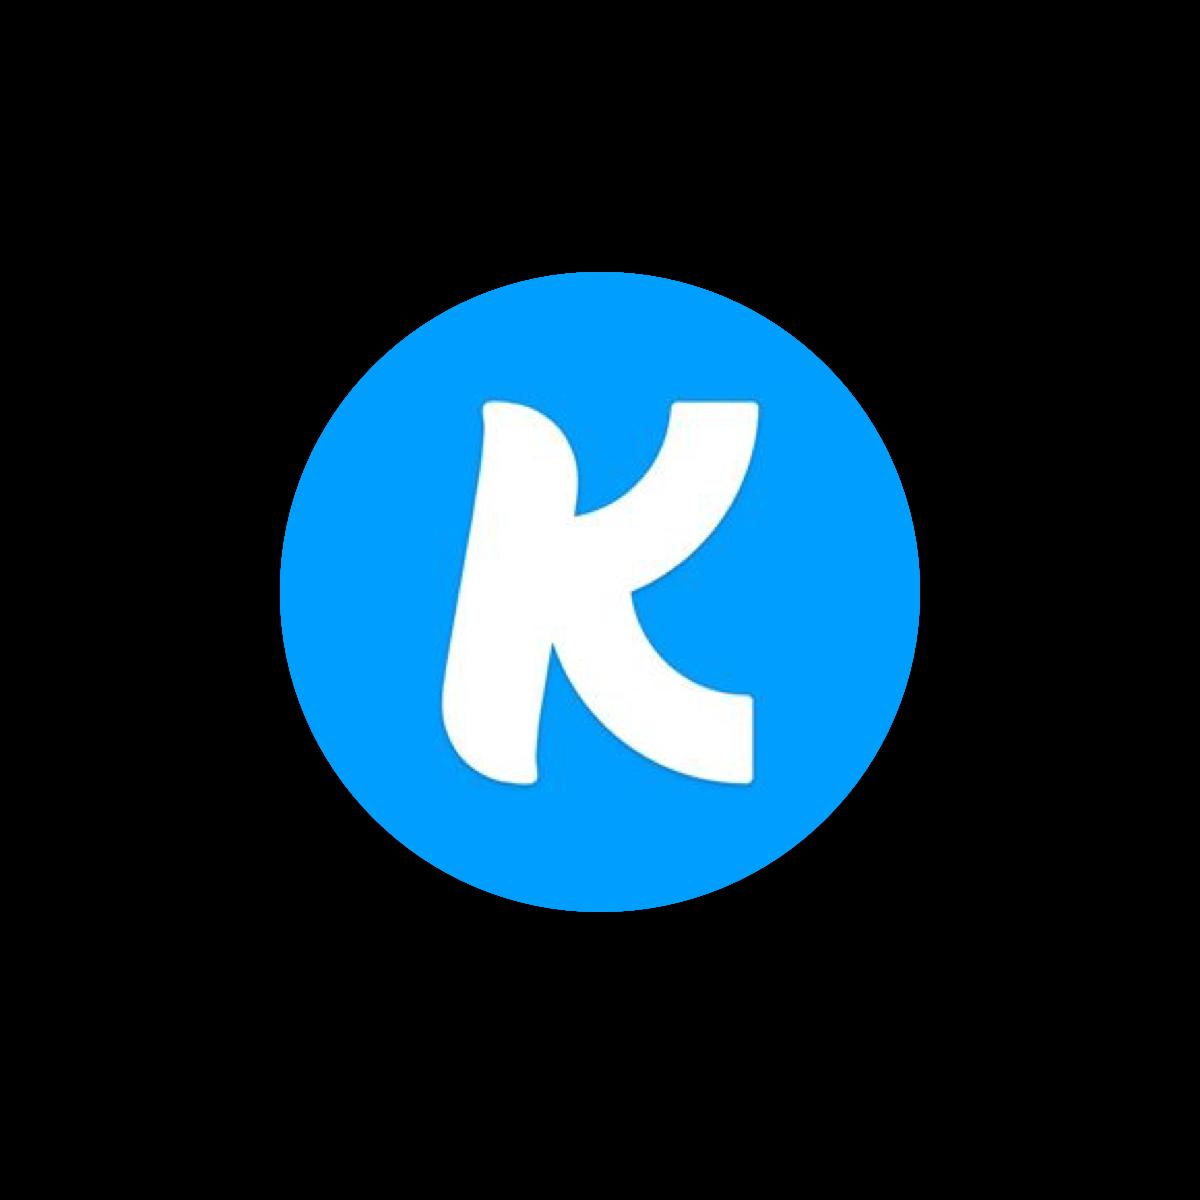 Cofounder, Creative Director - Digital Giving Platform. Fall 2011 - Summer 2018.